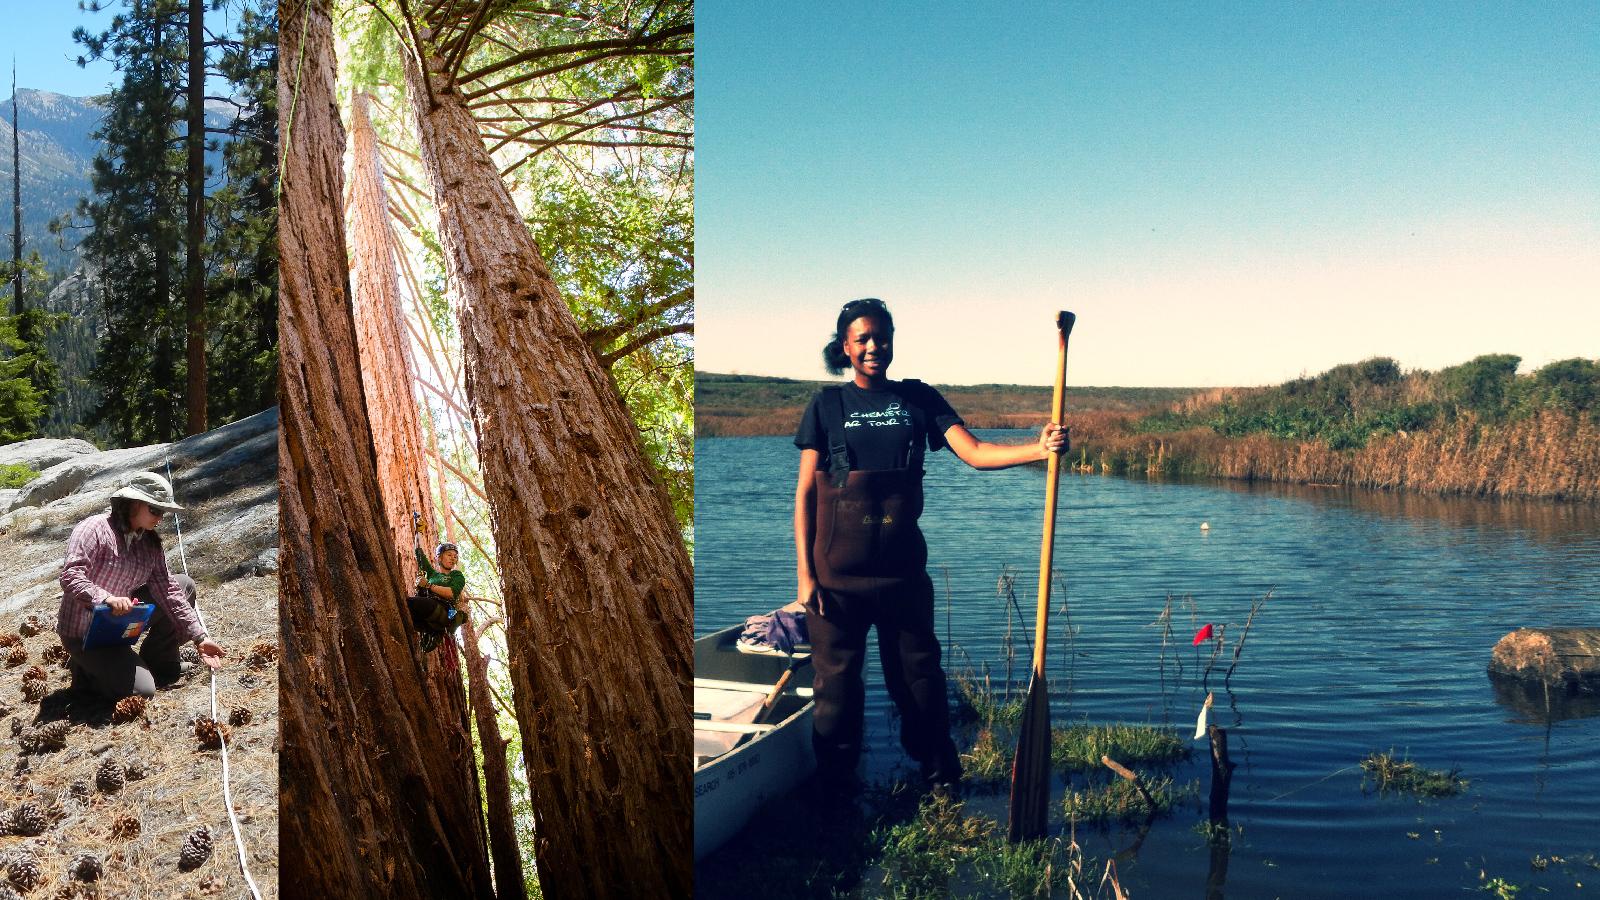 Photos courtesy of ESPM graduate students Kate Wilkin, Roxy Cruz, and Chandra Richards.